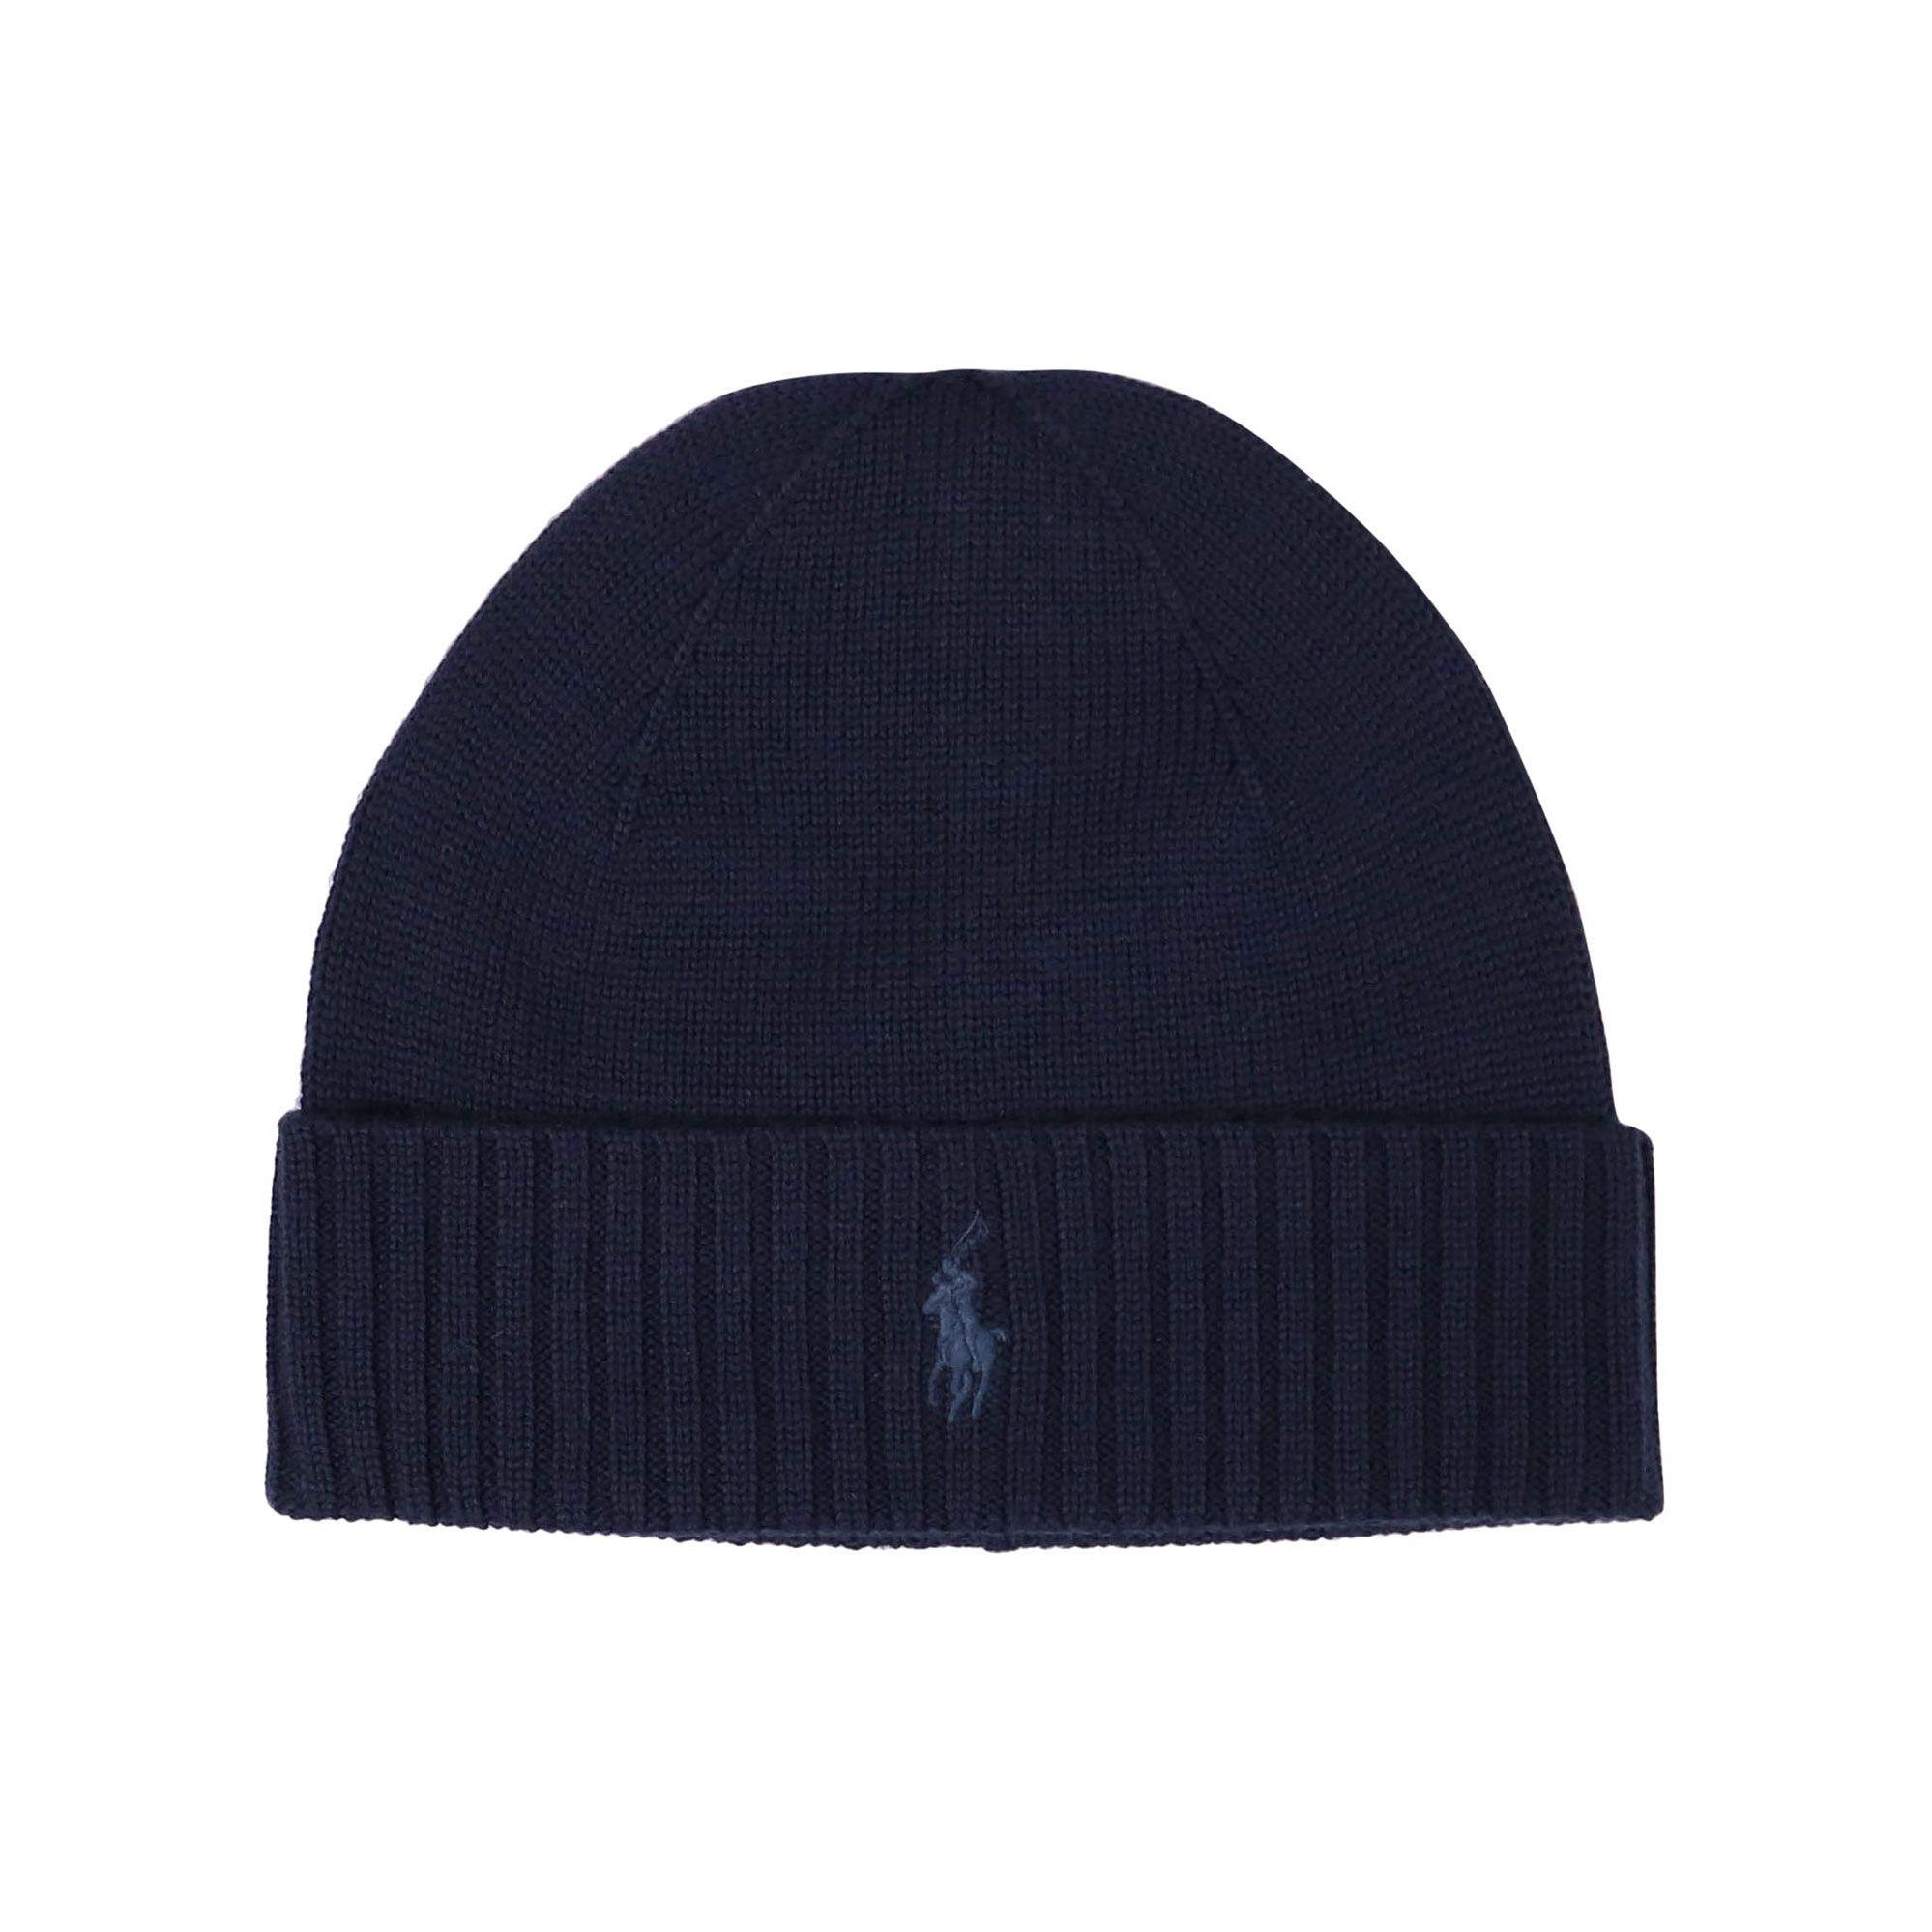 Frenesia Pronunciare catena  buy > cappelli ralph lauren roma, Up to 75% OFF